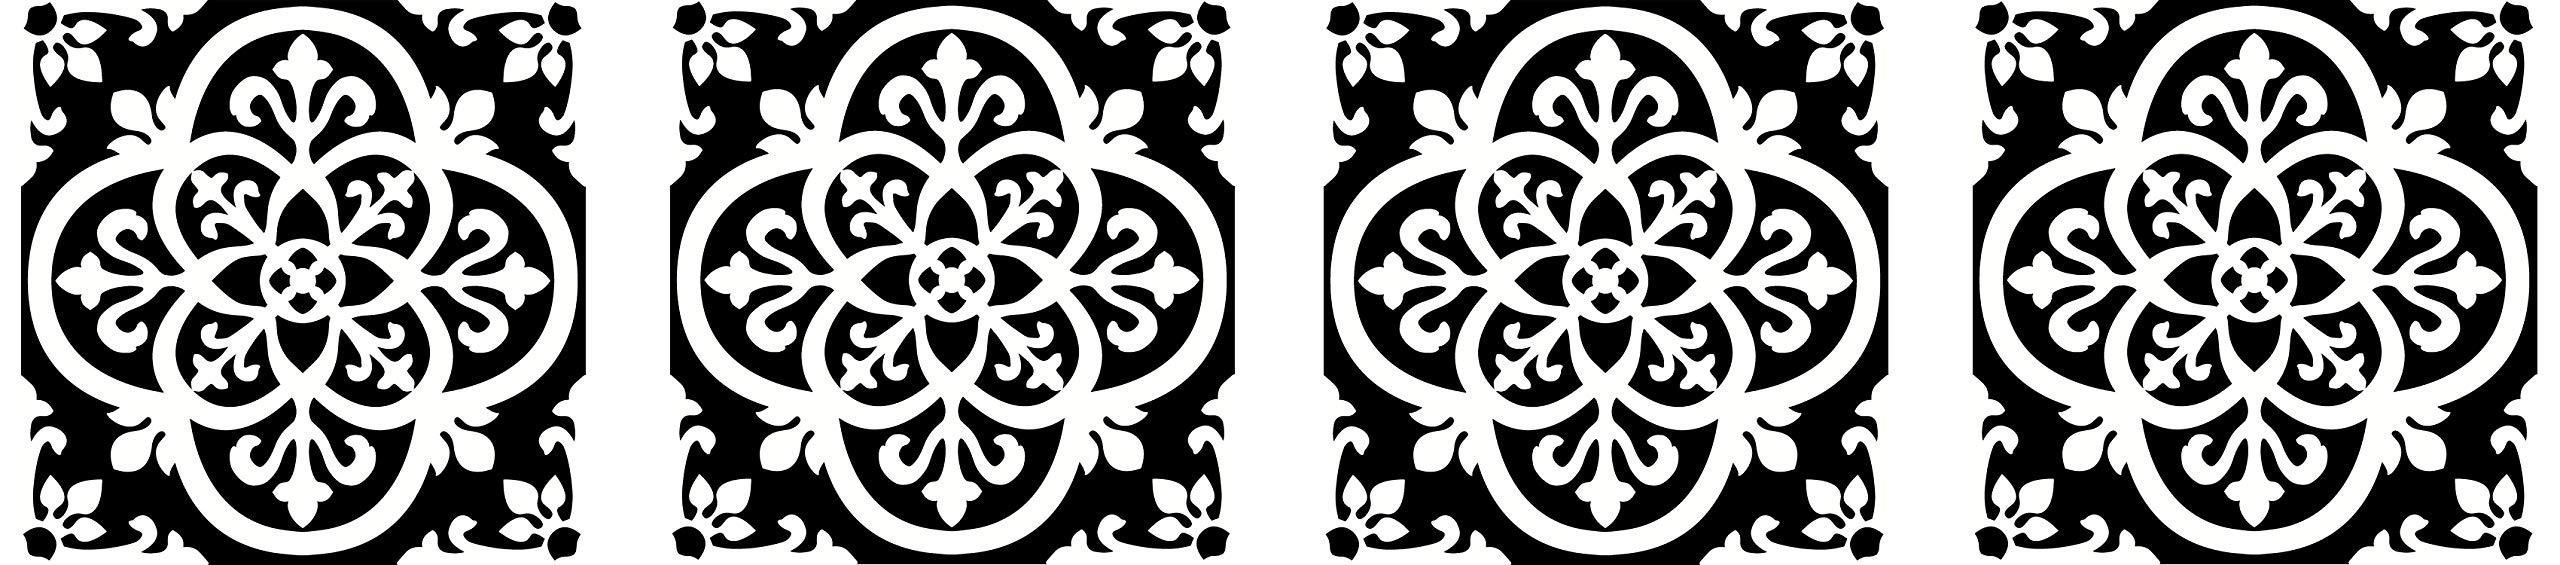 FloorPops FP2475 Gothic Peel & Stick Tiles Floor Decal Black (Fоur Расk) by FloorPops (Image #1)